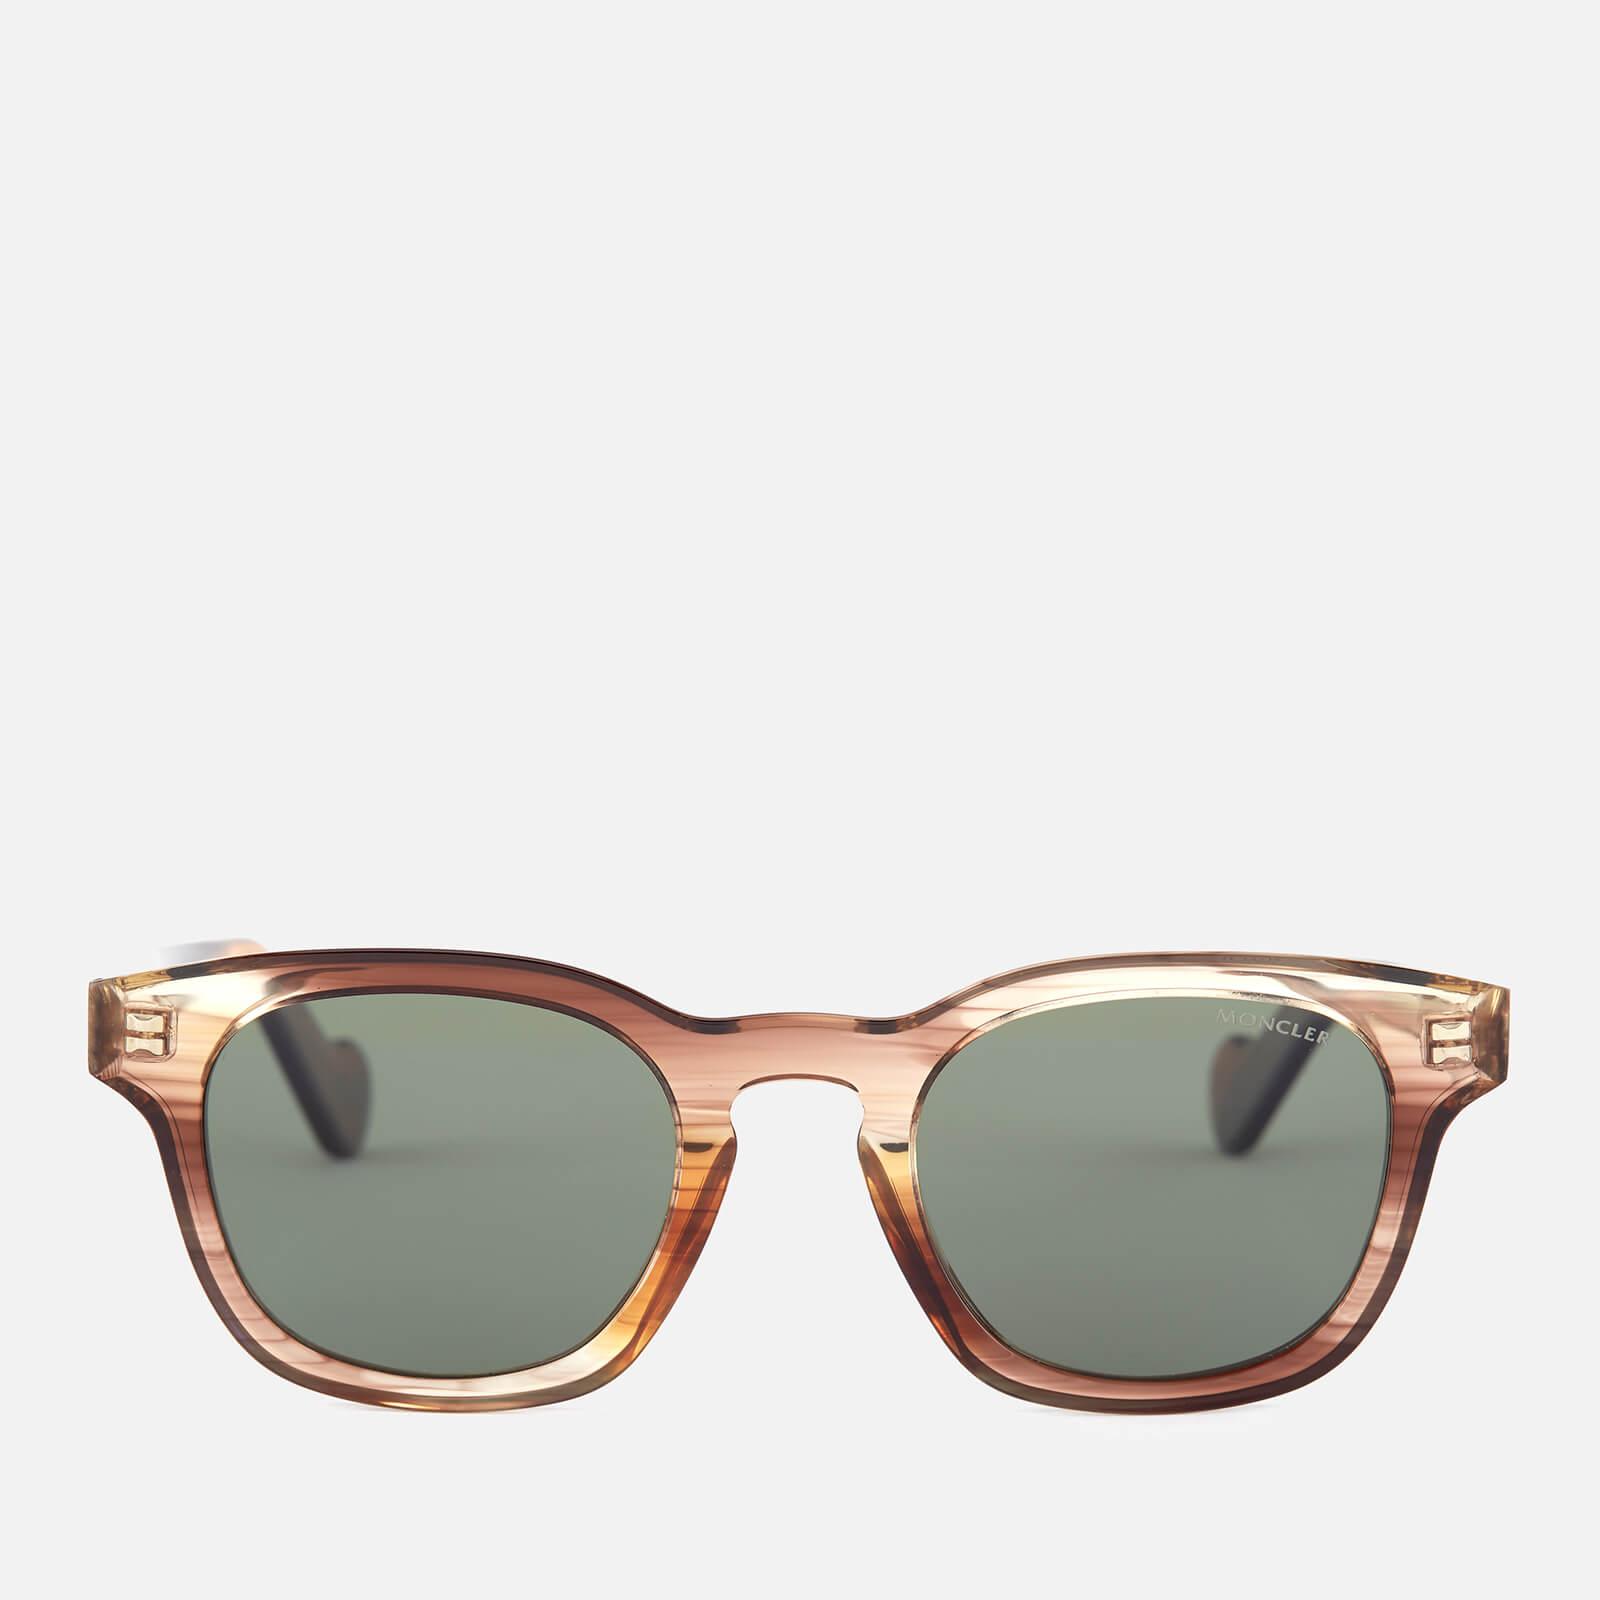 d79a2935b3 Moncler Men s Wayfarer Sunglasses - Light Brown Other Green Polarized -  Free UK Delivery over £50